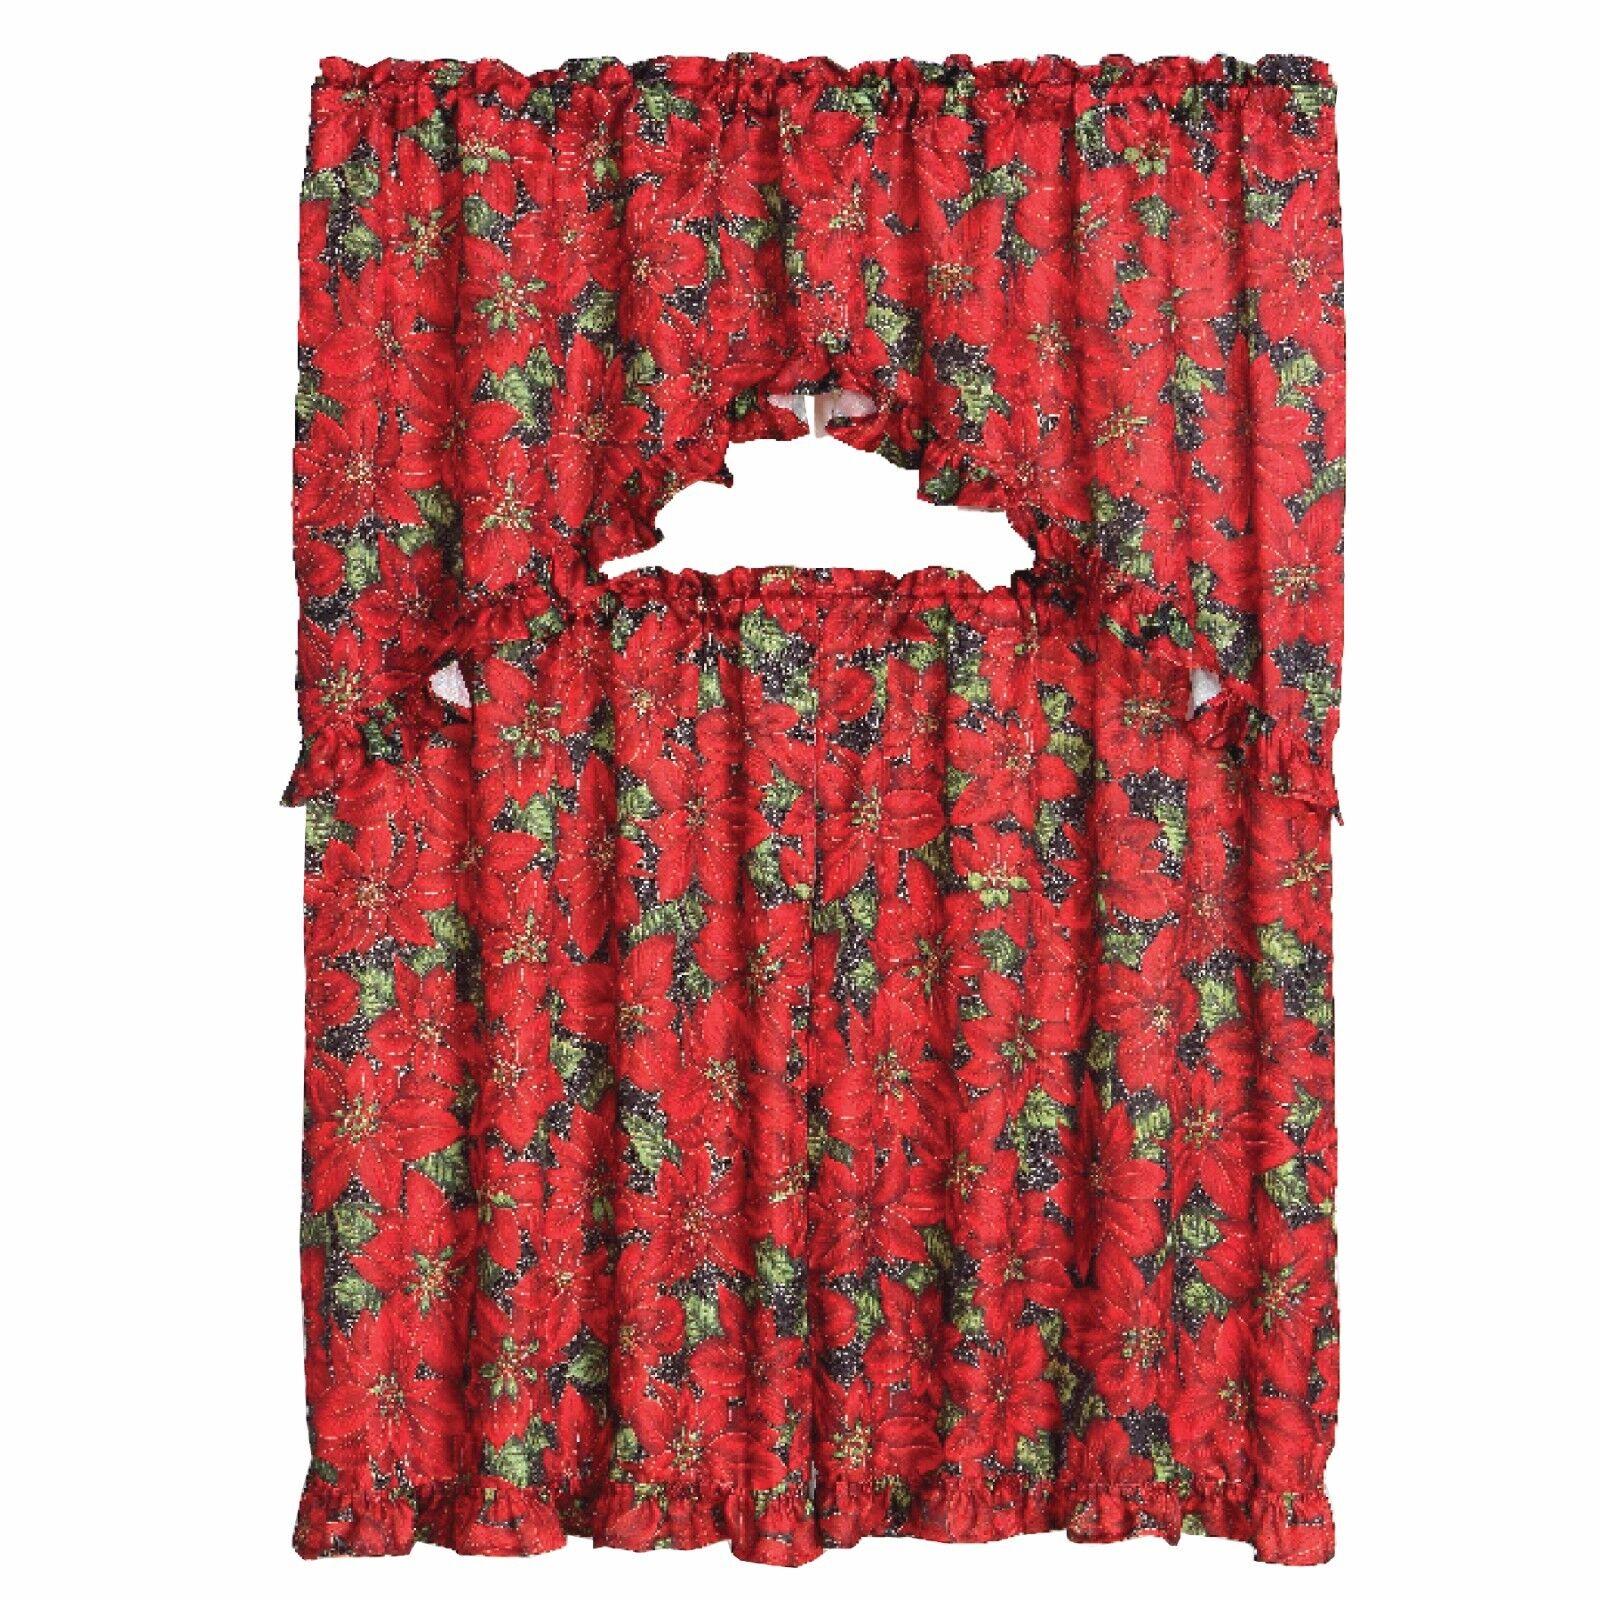 3 Piece Christmas Decorative Kitchen Curtain Set Ruffled